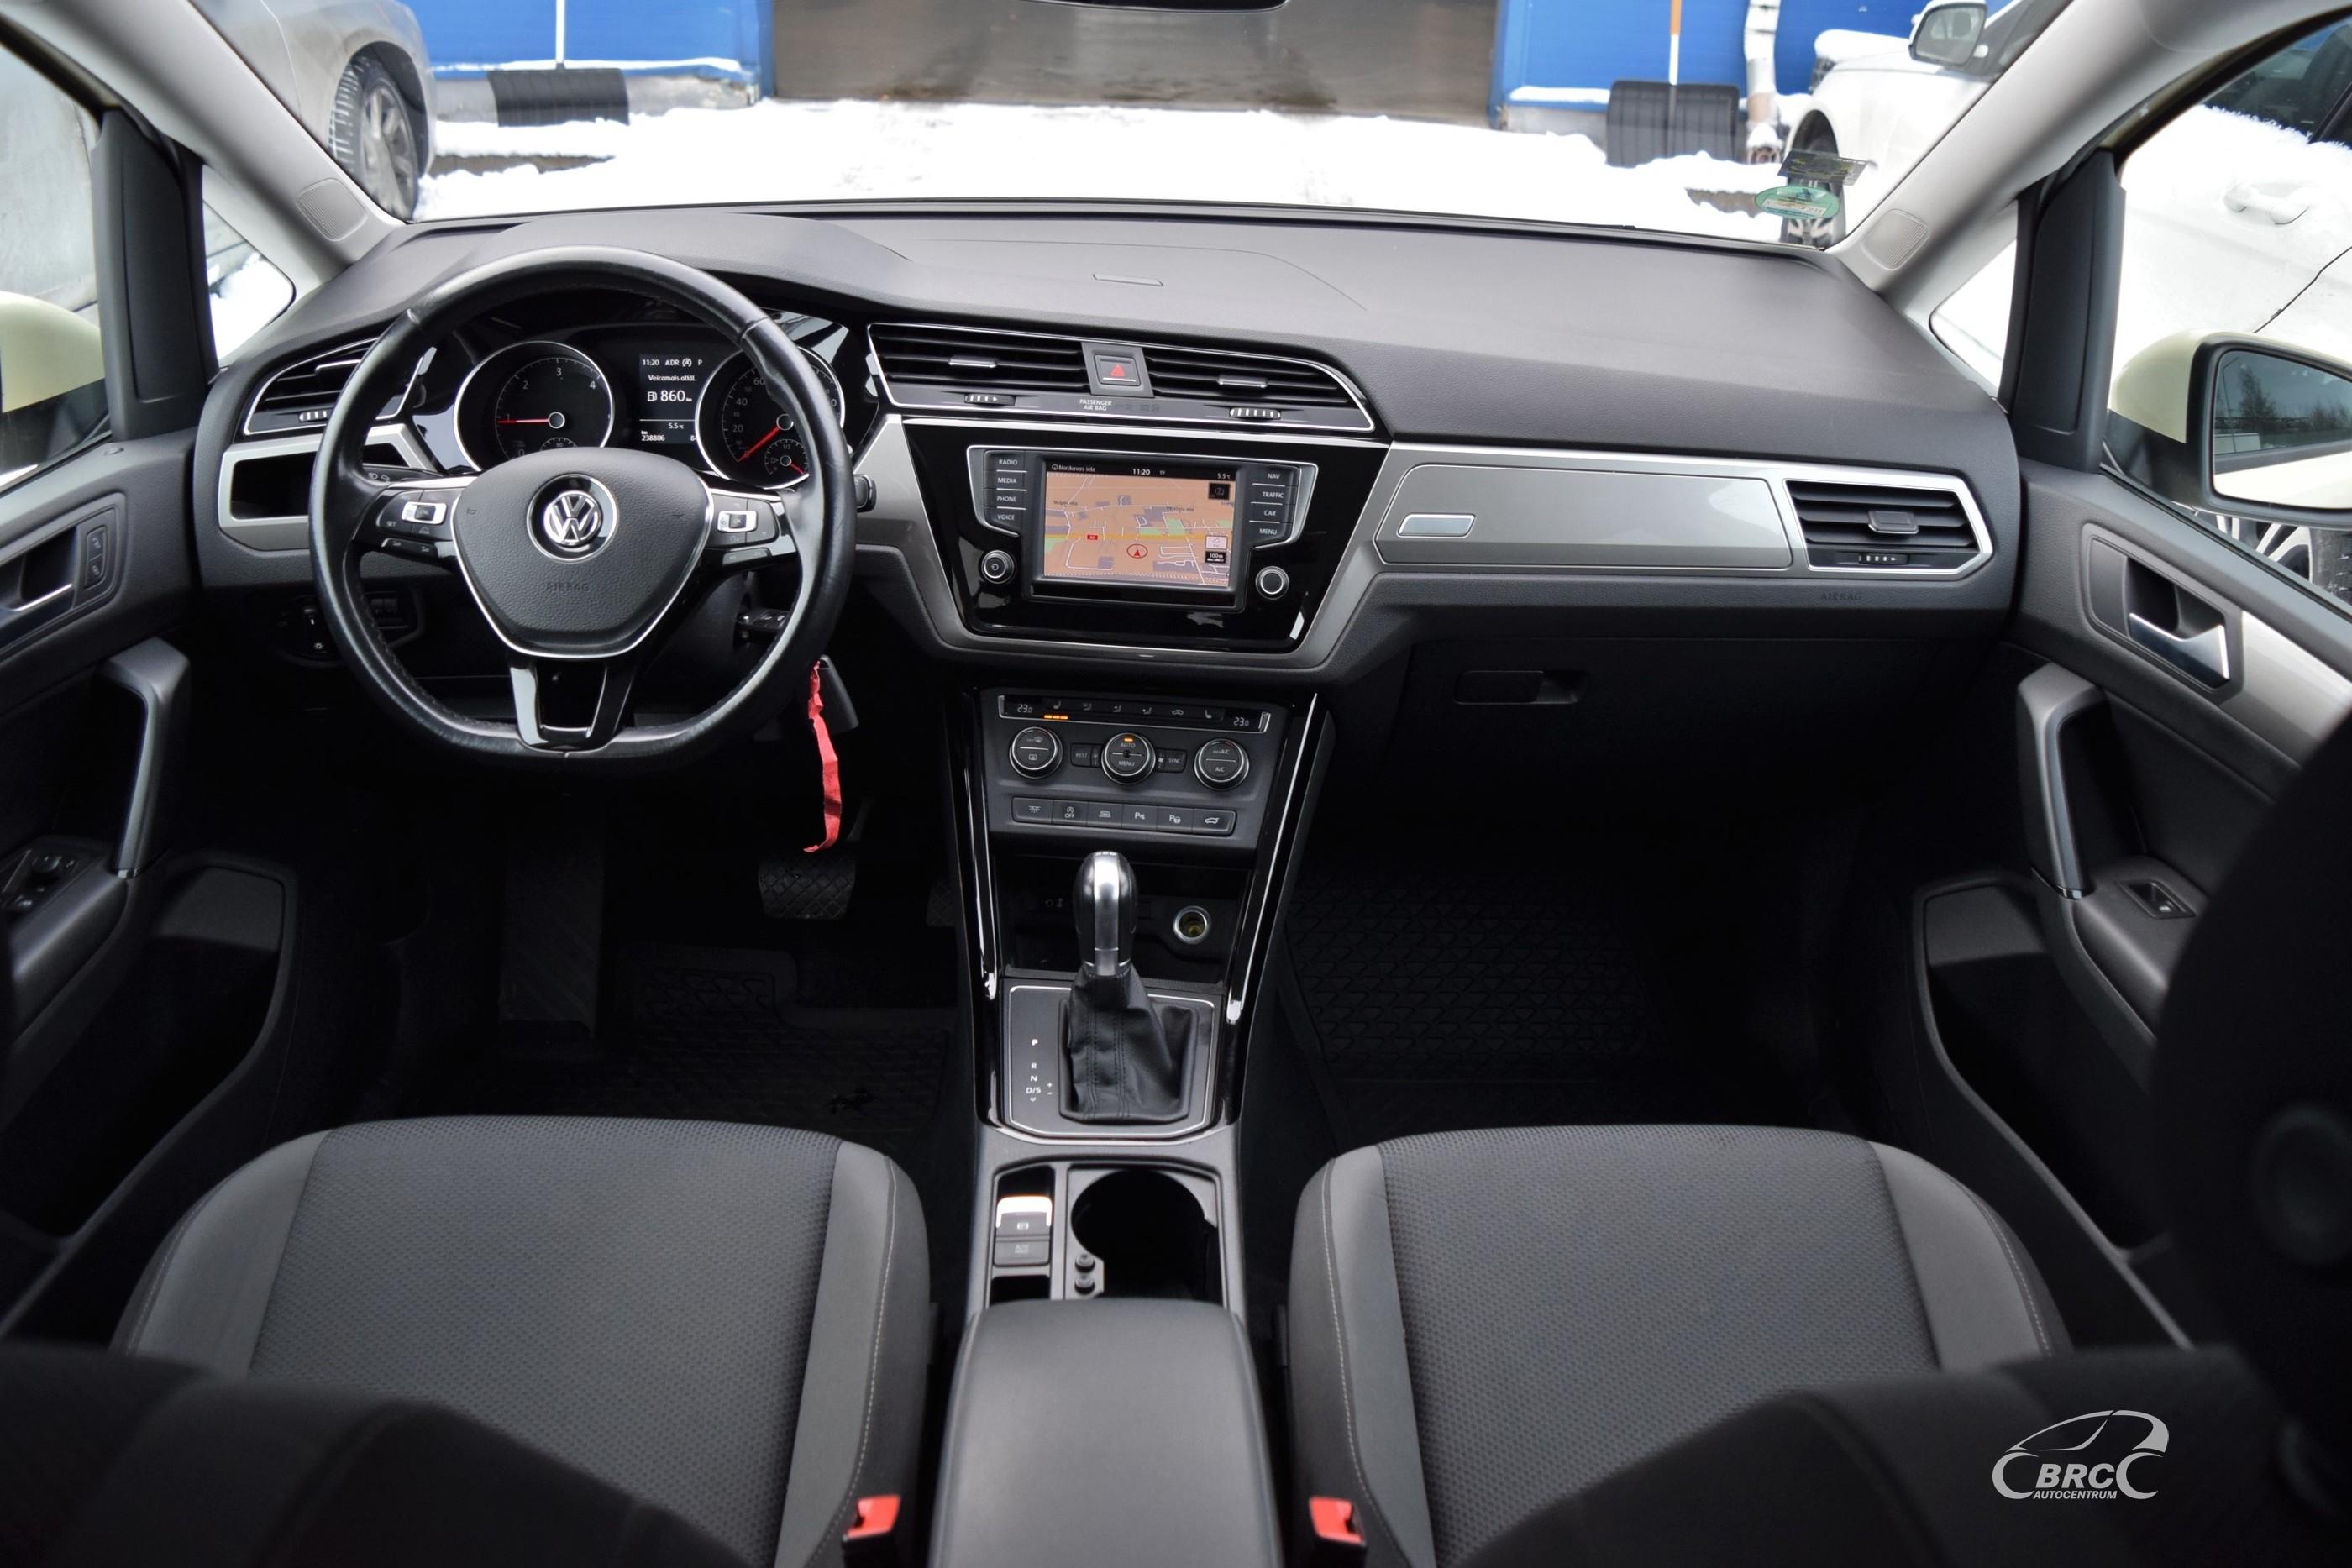 Volkswagen Touran 2.0TDI DSG 7seats